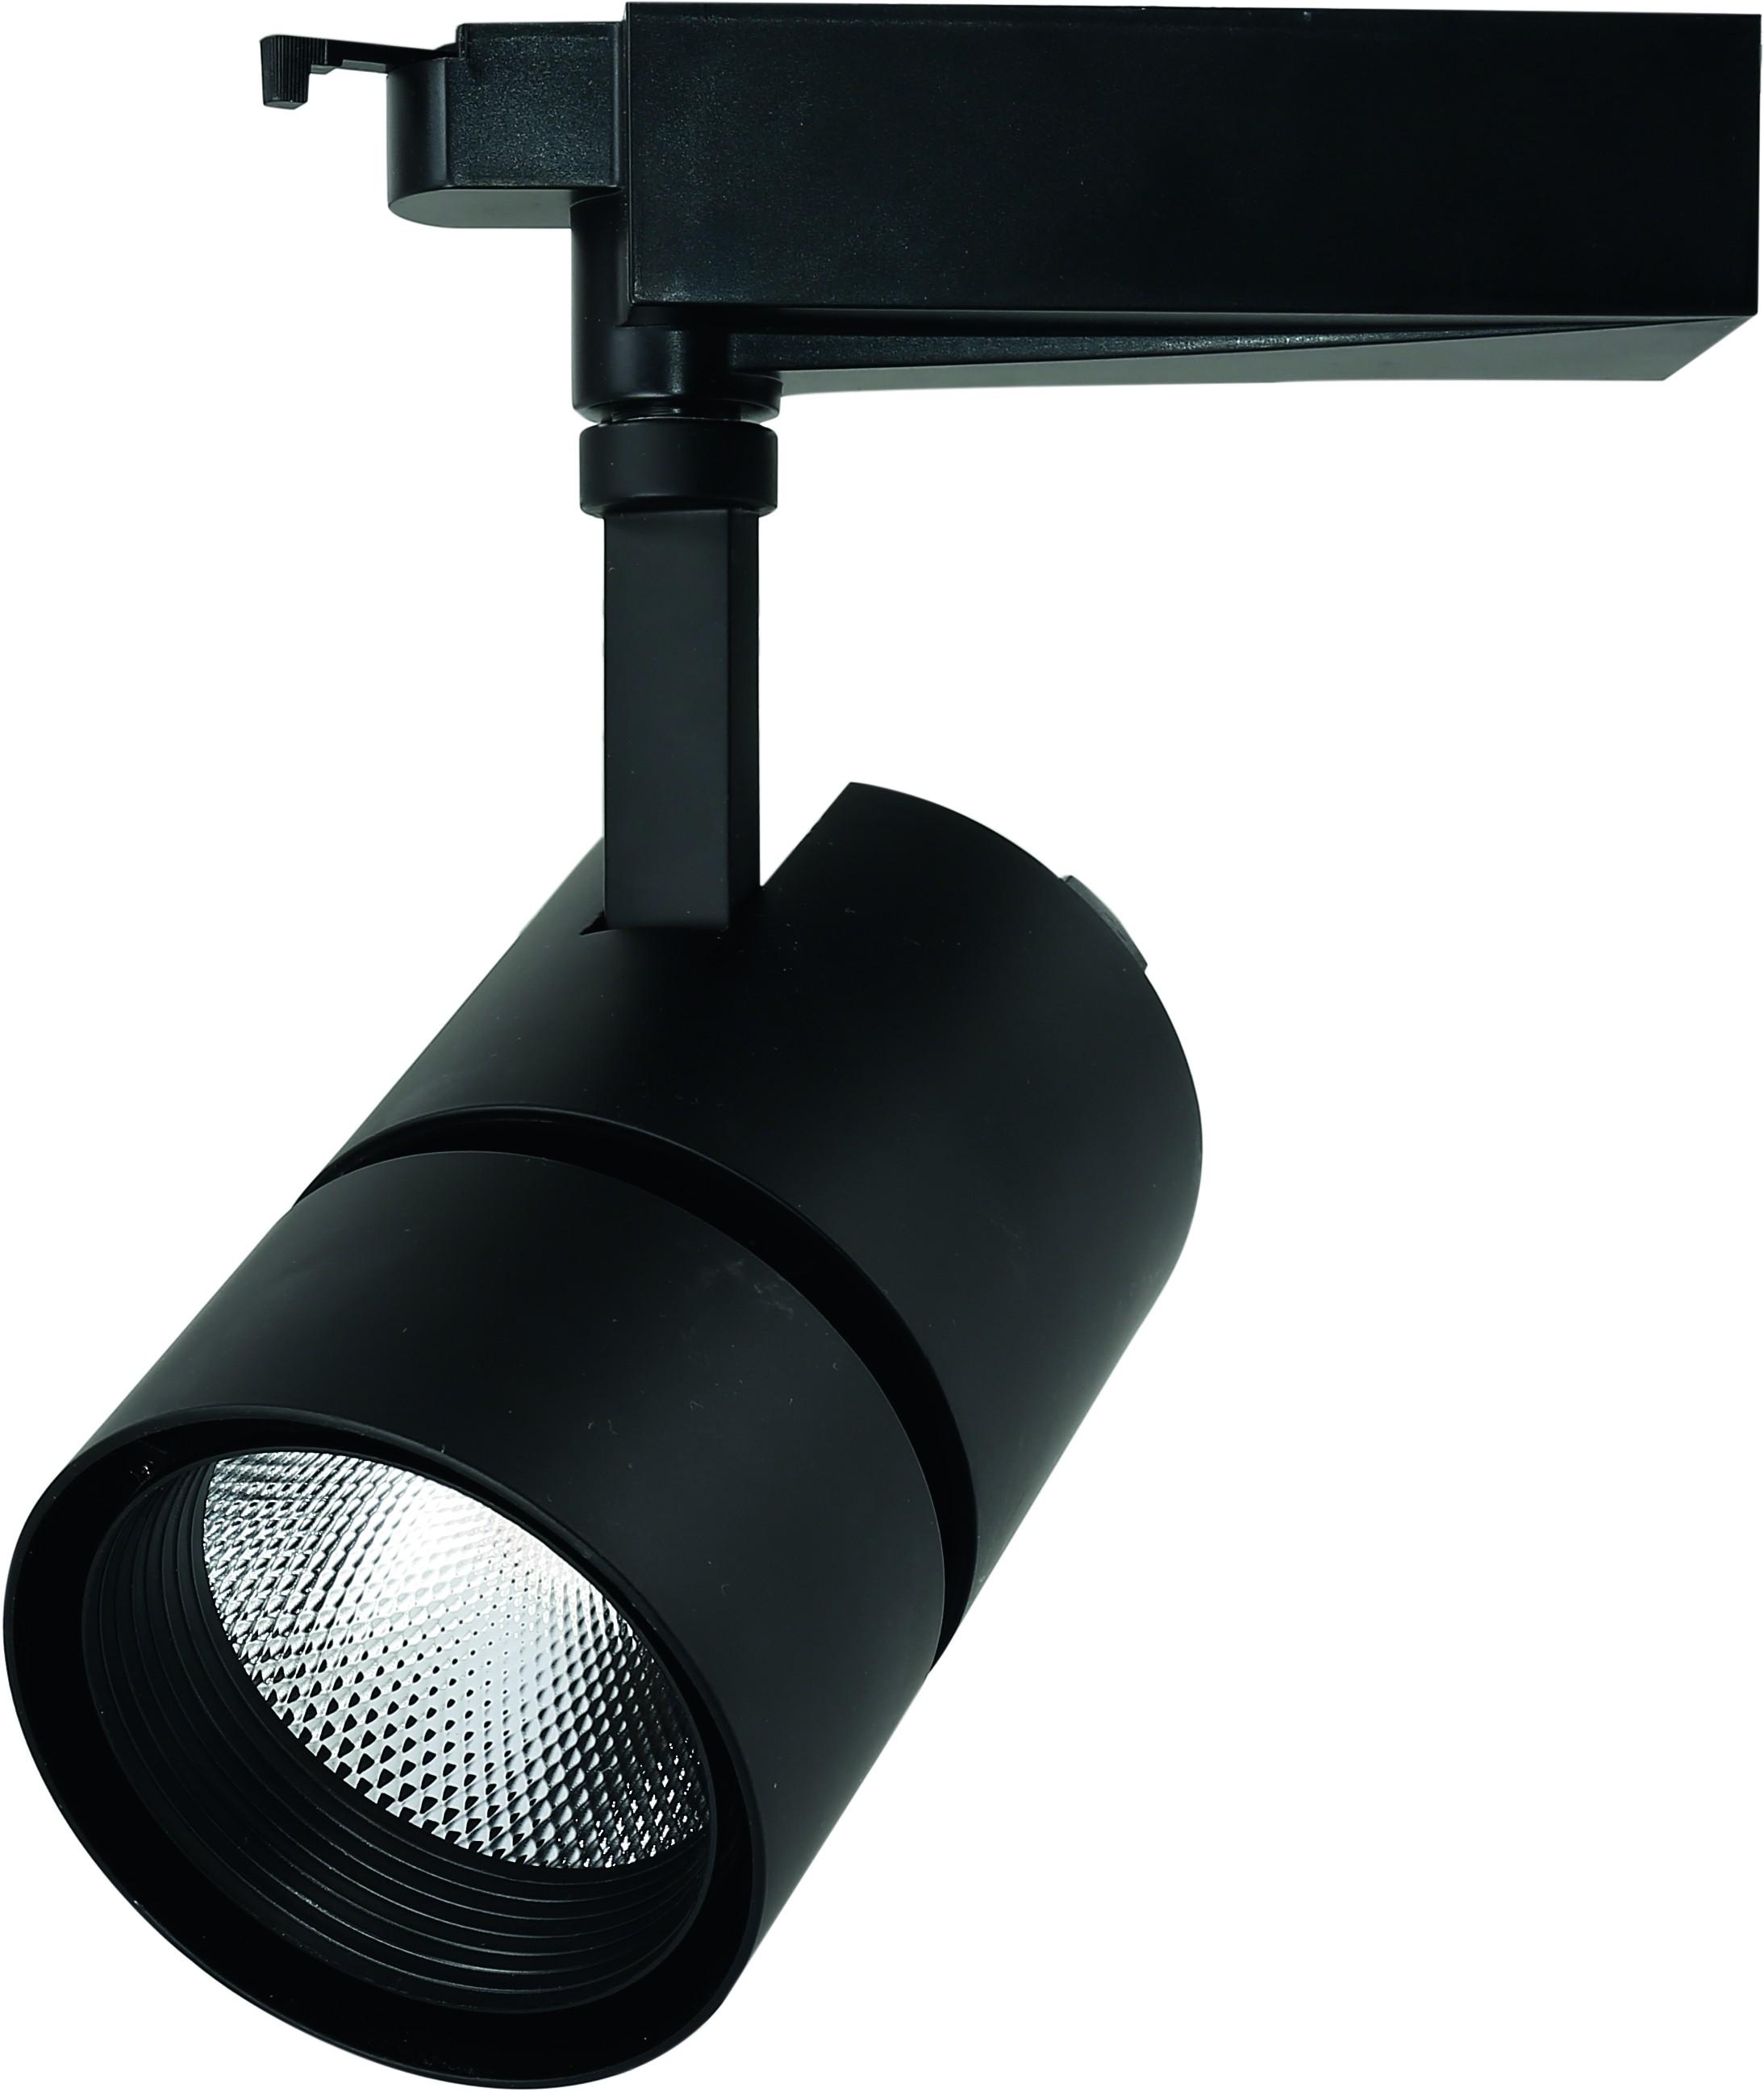 Трек система Arte lamp A2450pl-1bk